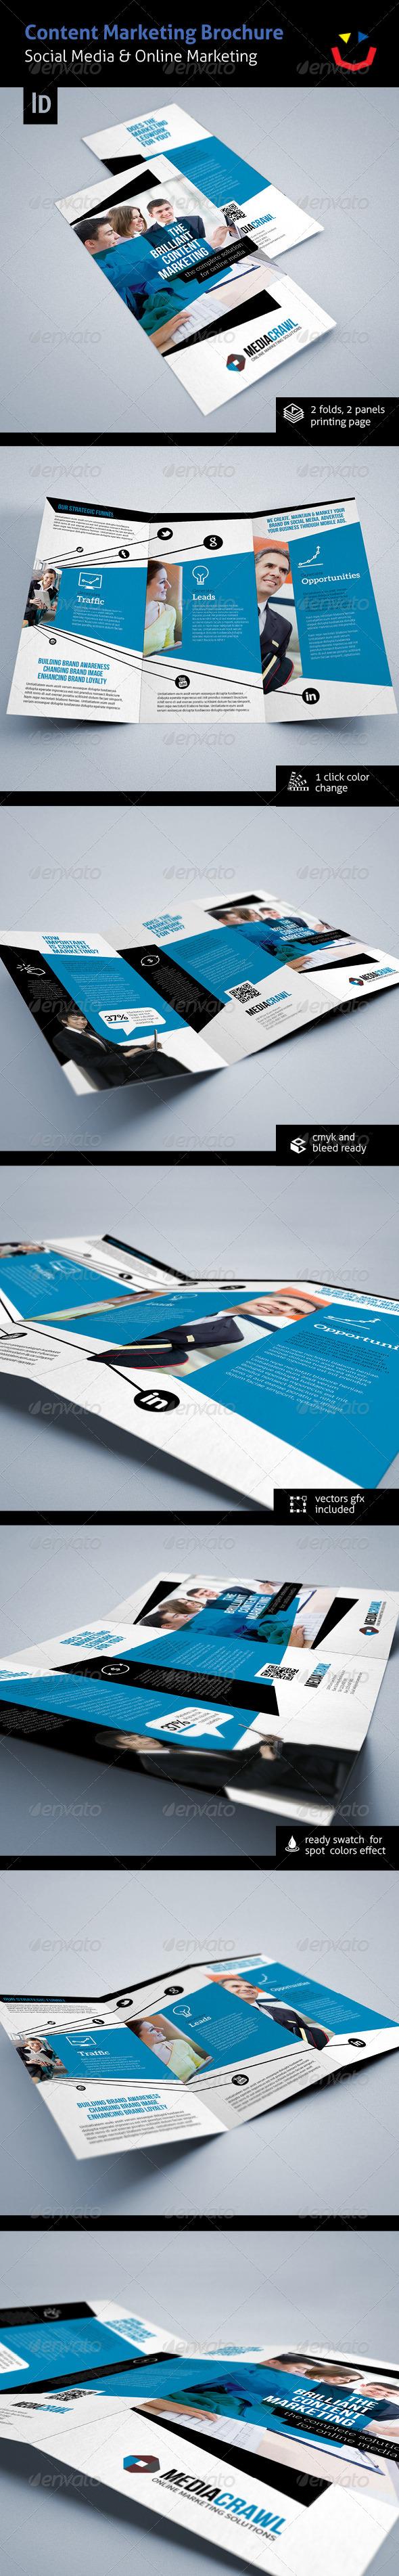 Online/Content Marketing Brochure - Brochures Print Templates